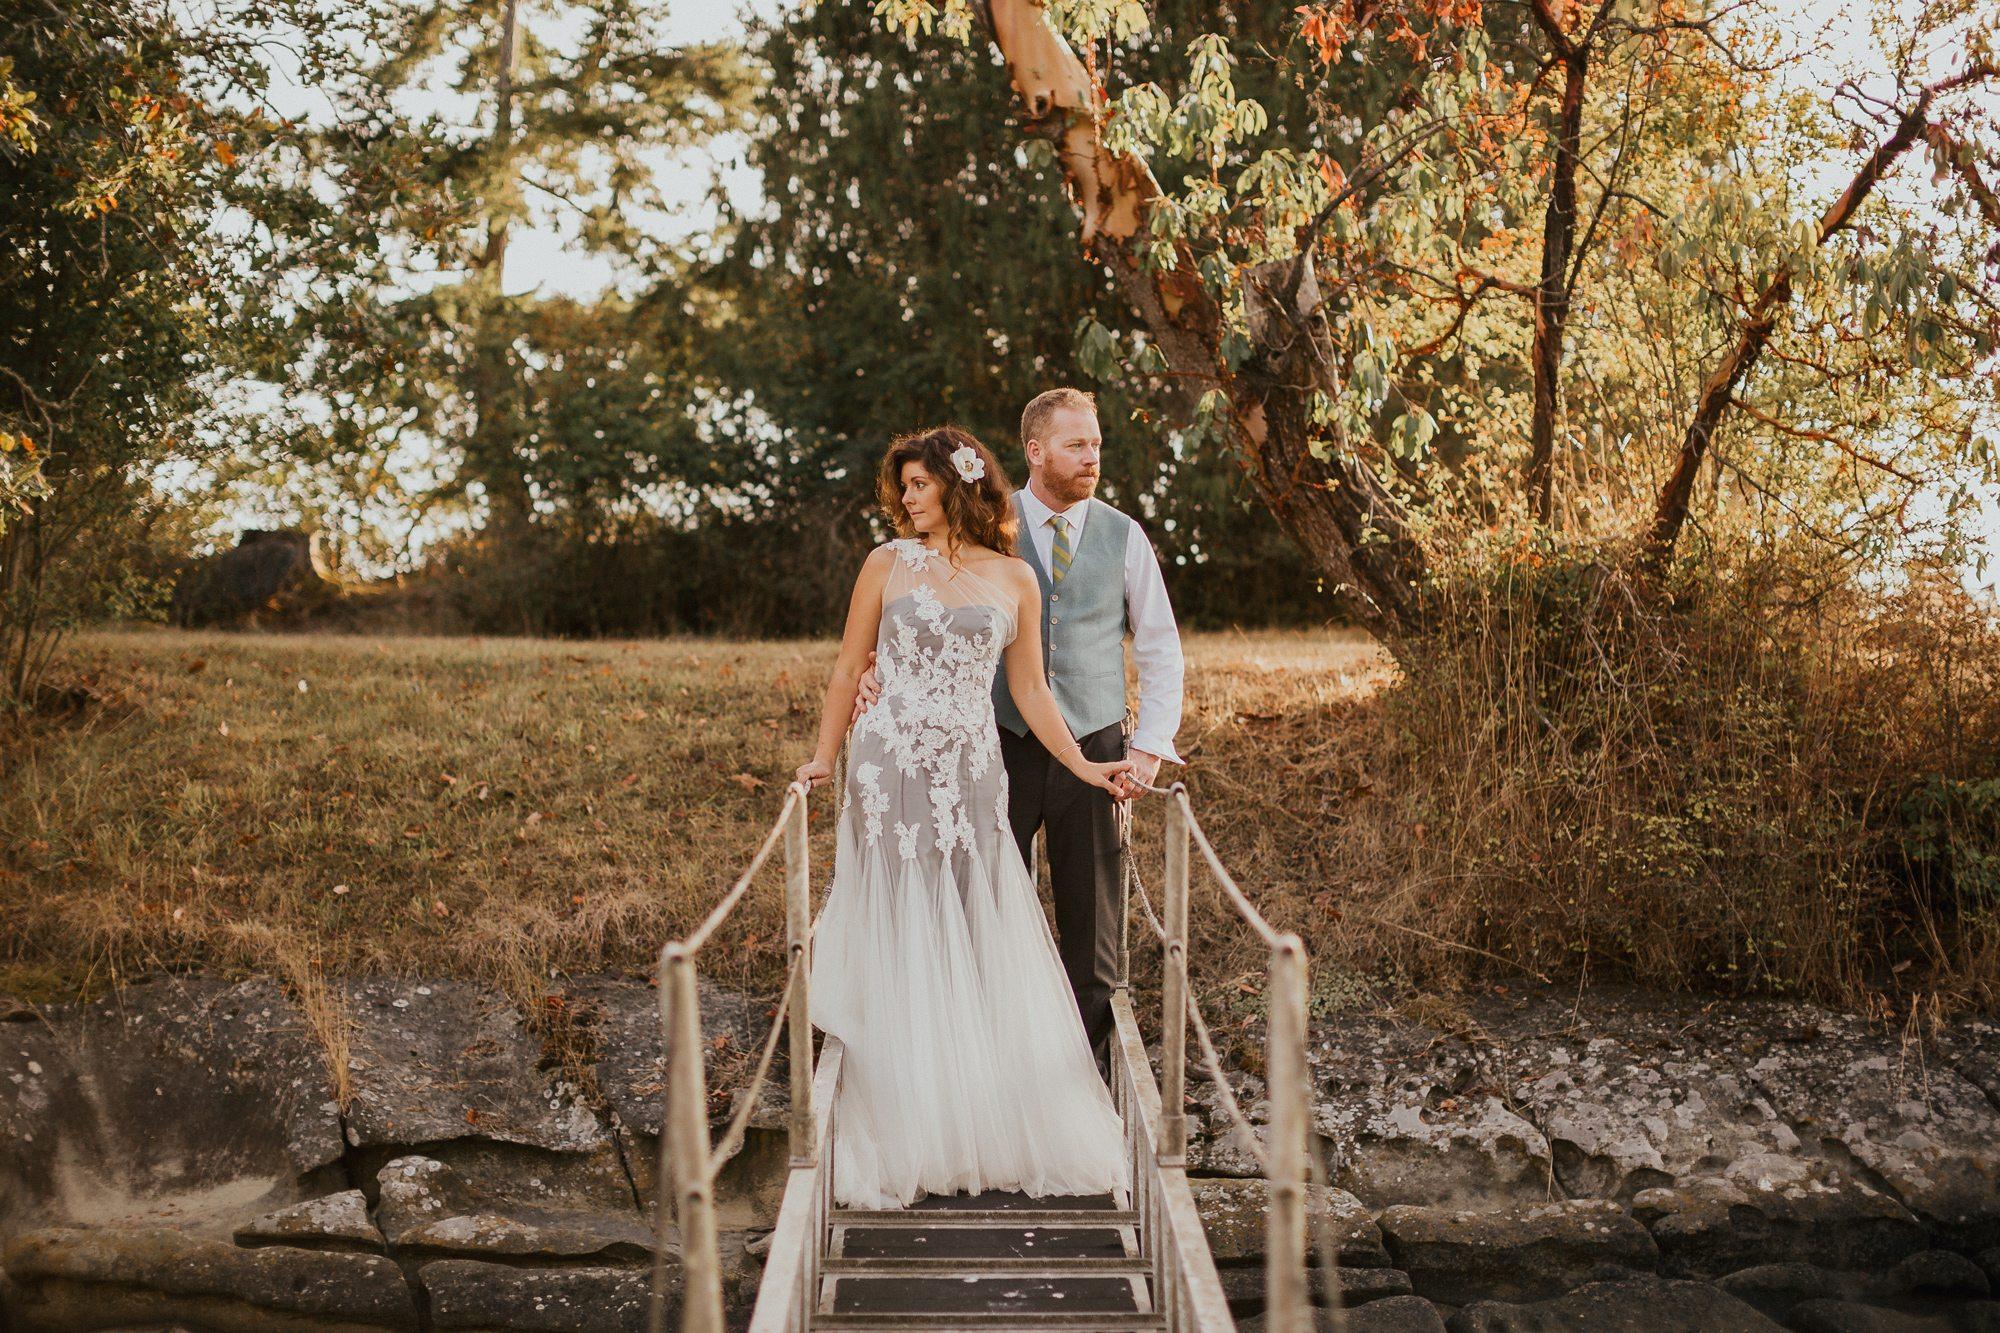 sarah-sal-galiano-wedding-photographer62